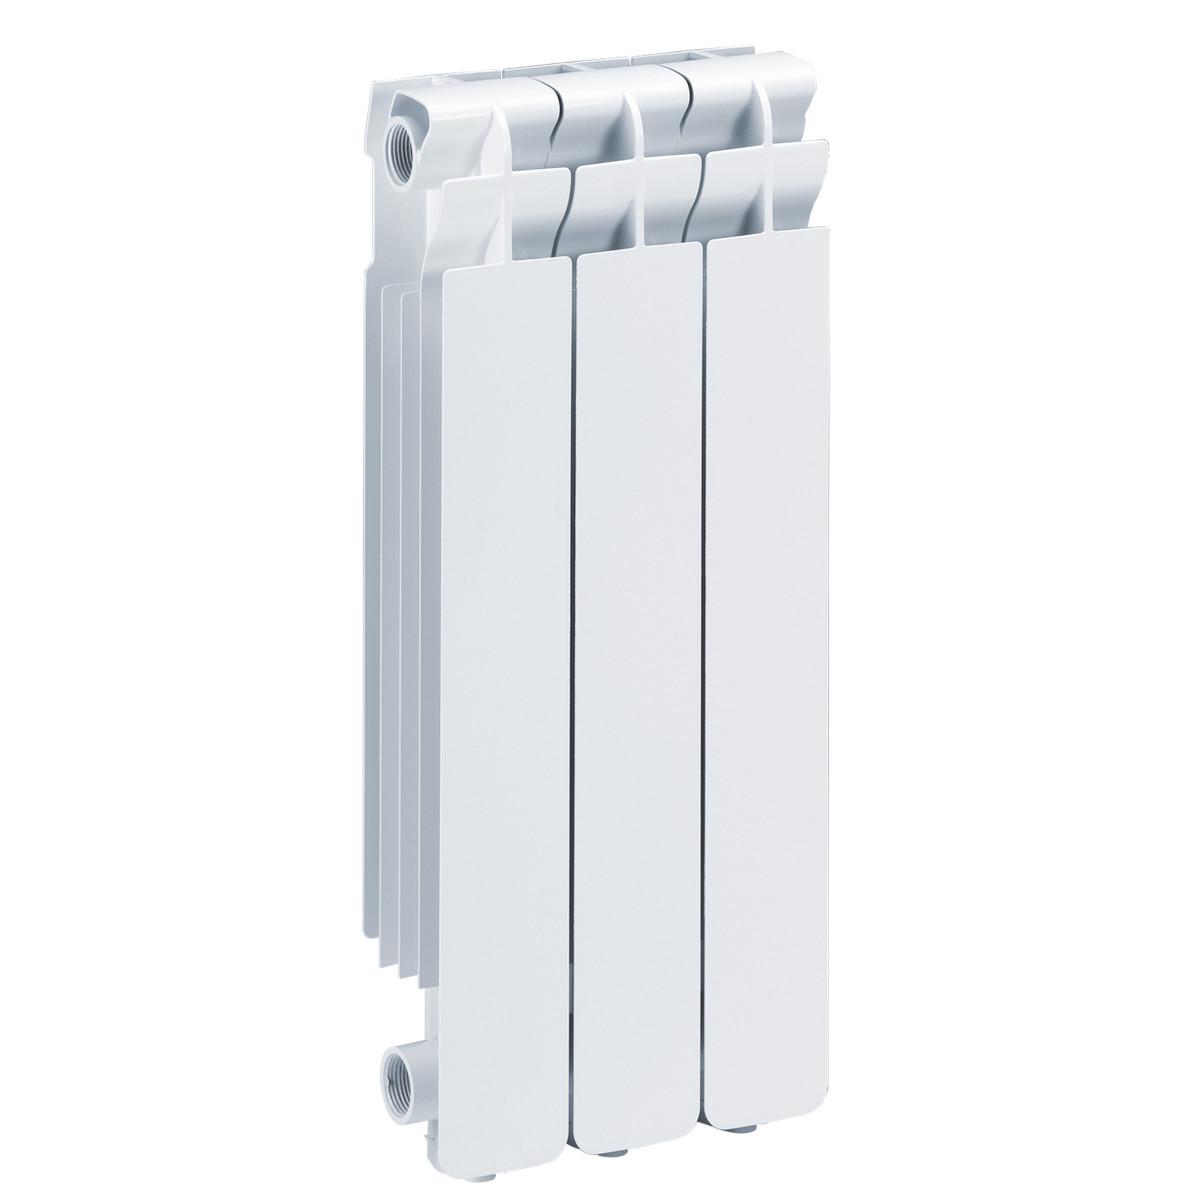 Radiatori alluminio termosifone radiatori2000 mod helyos for Leroy merlin radiatori